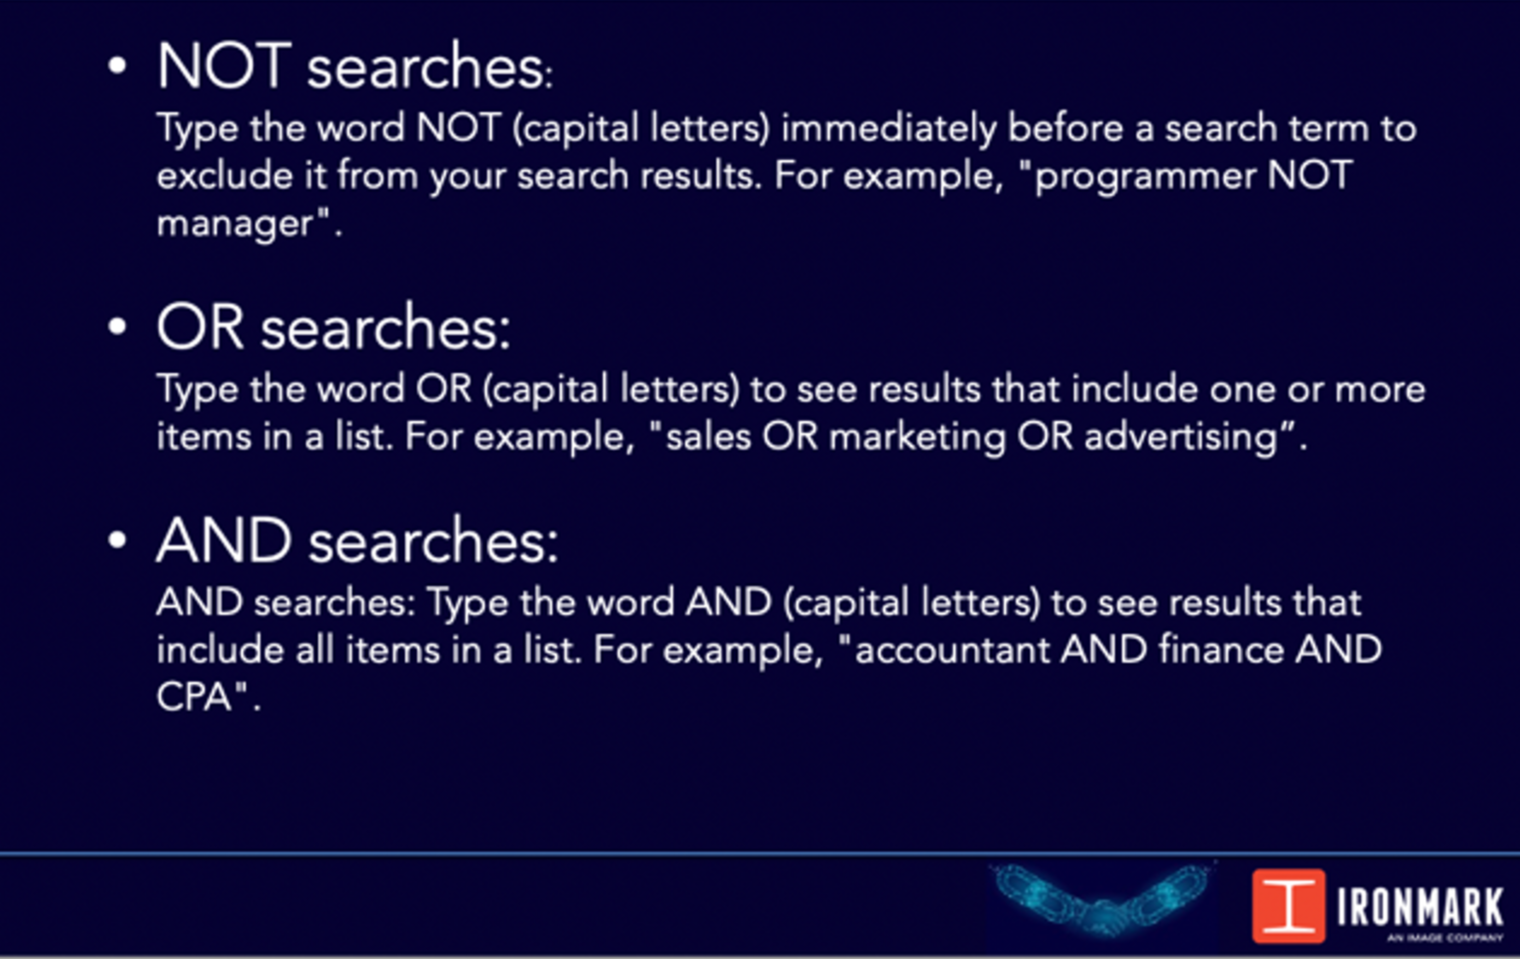 LinkedIn People Search Training   Ironmark - An Image Company